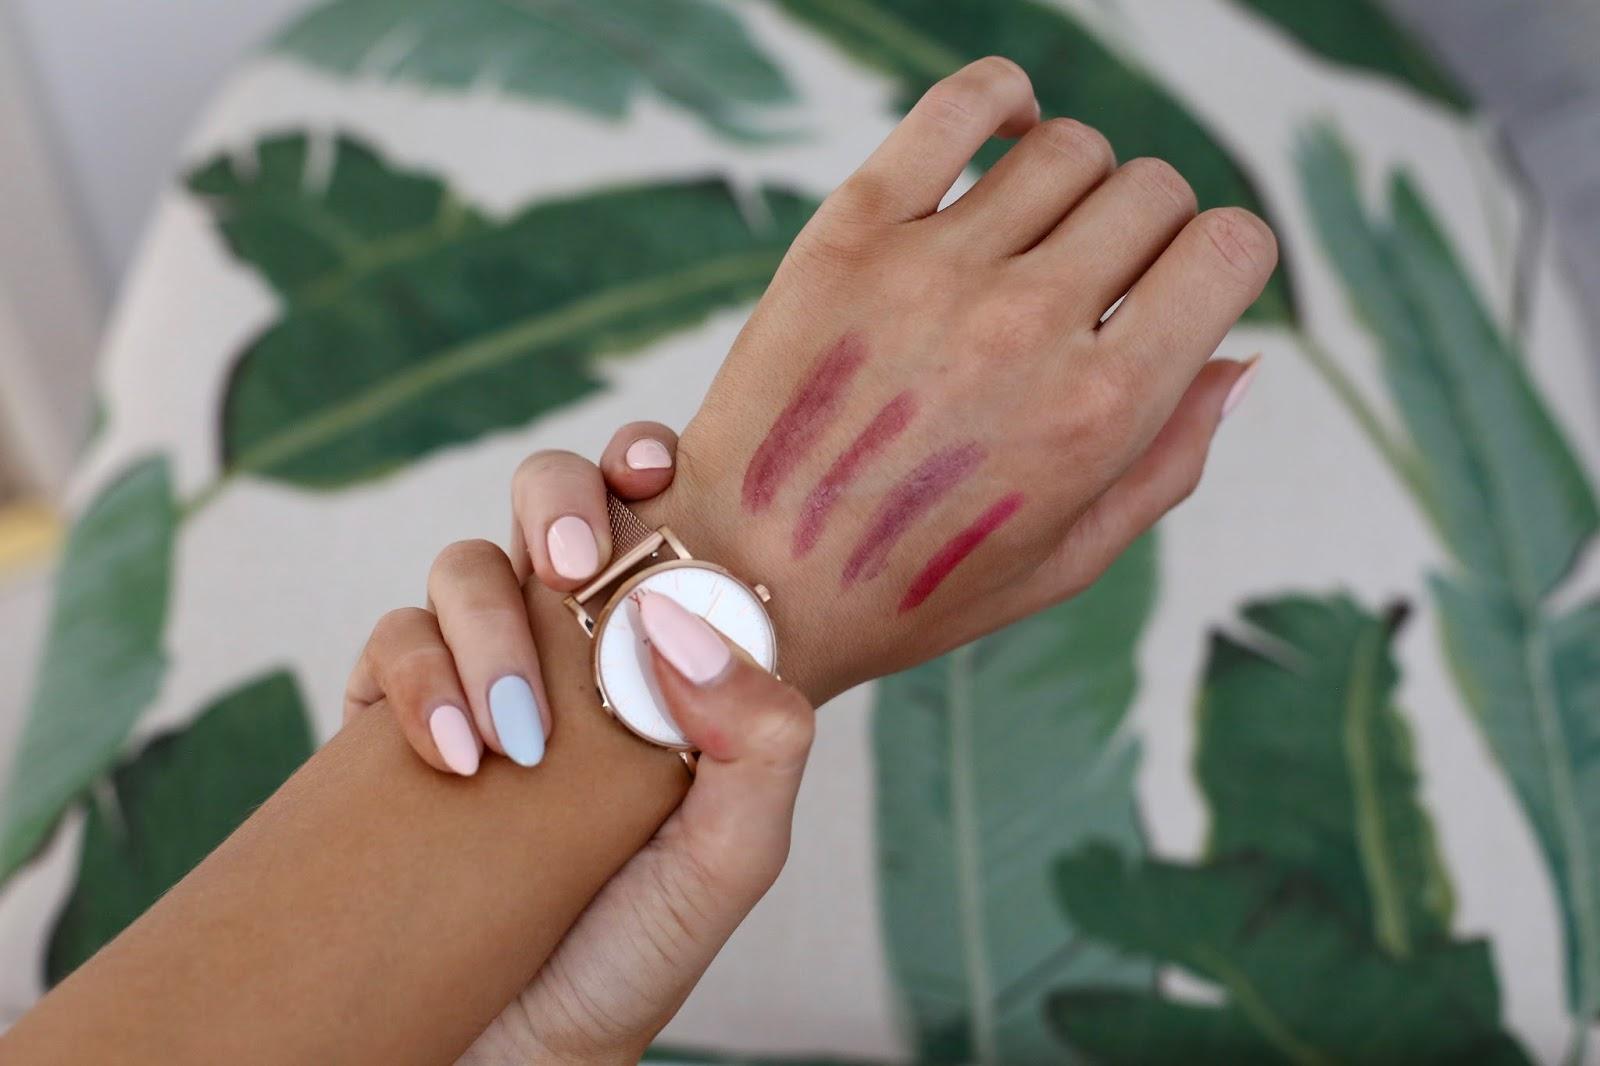 Armani lipstick swatches